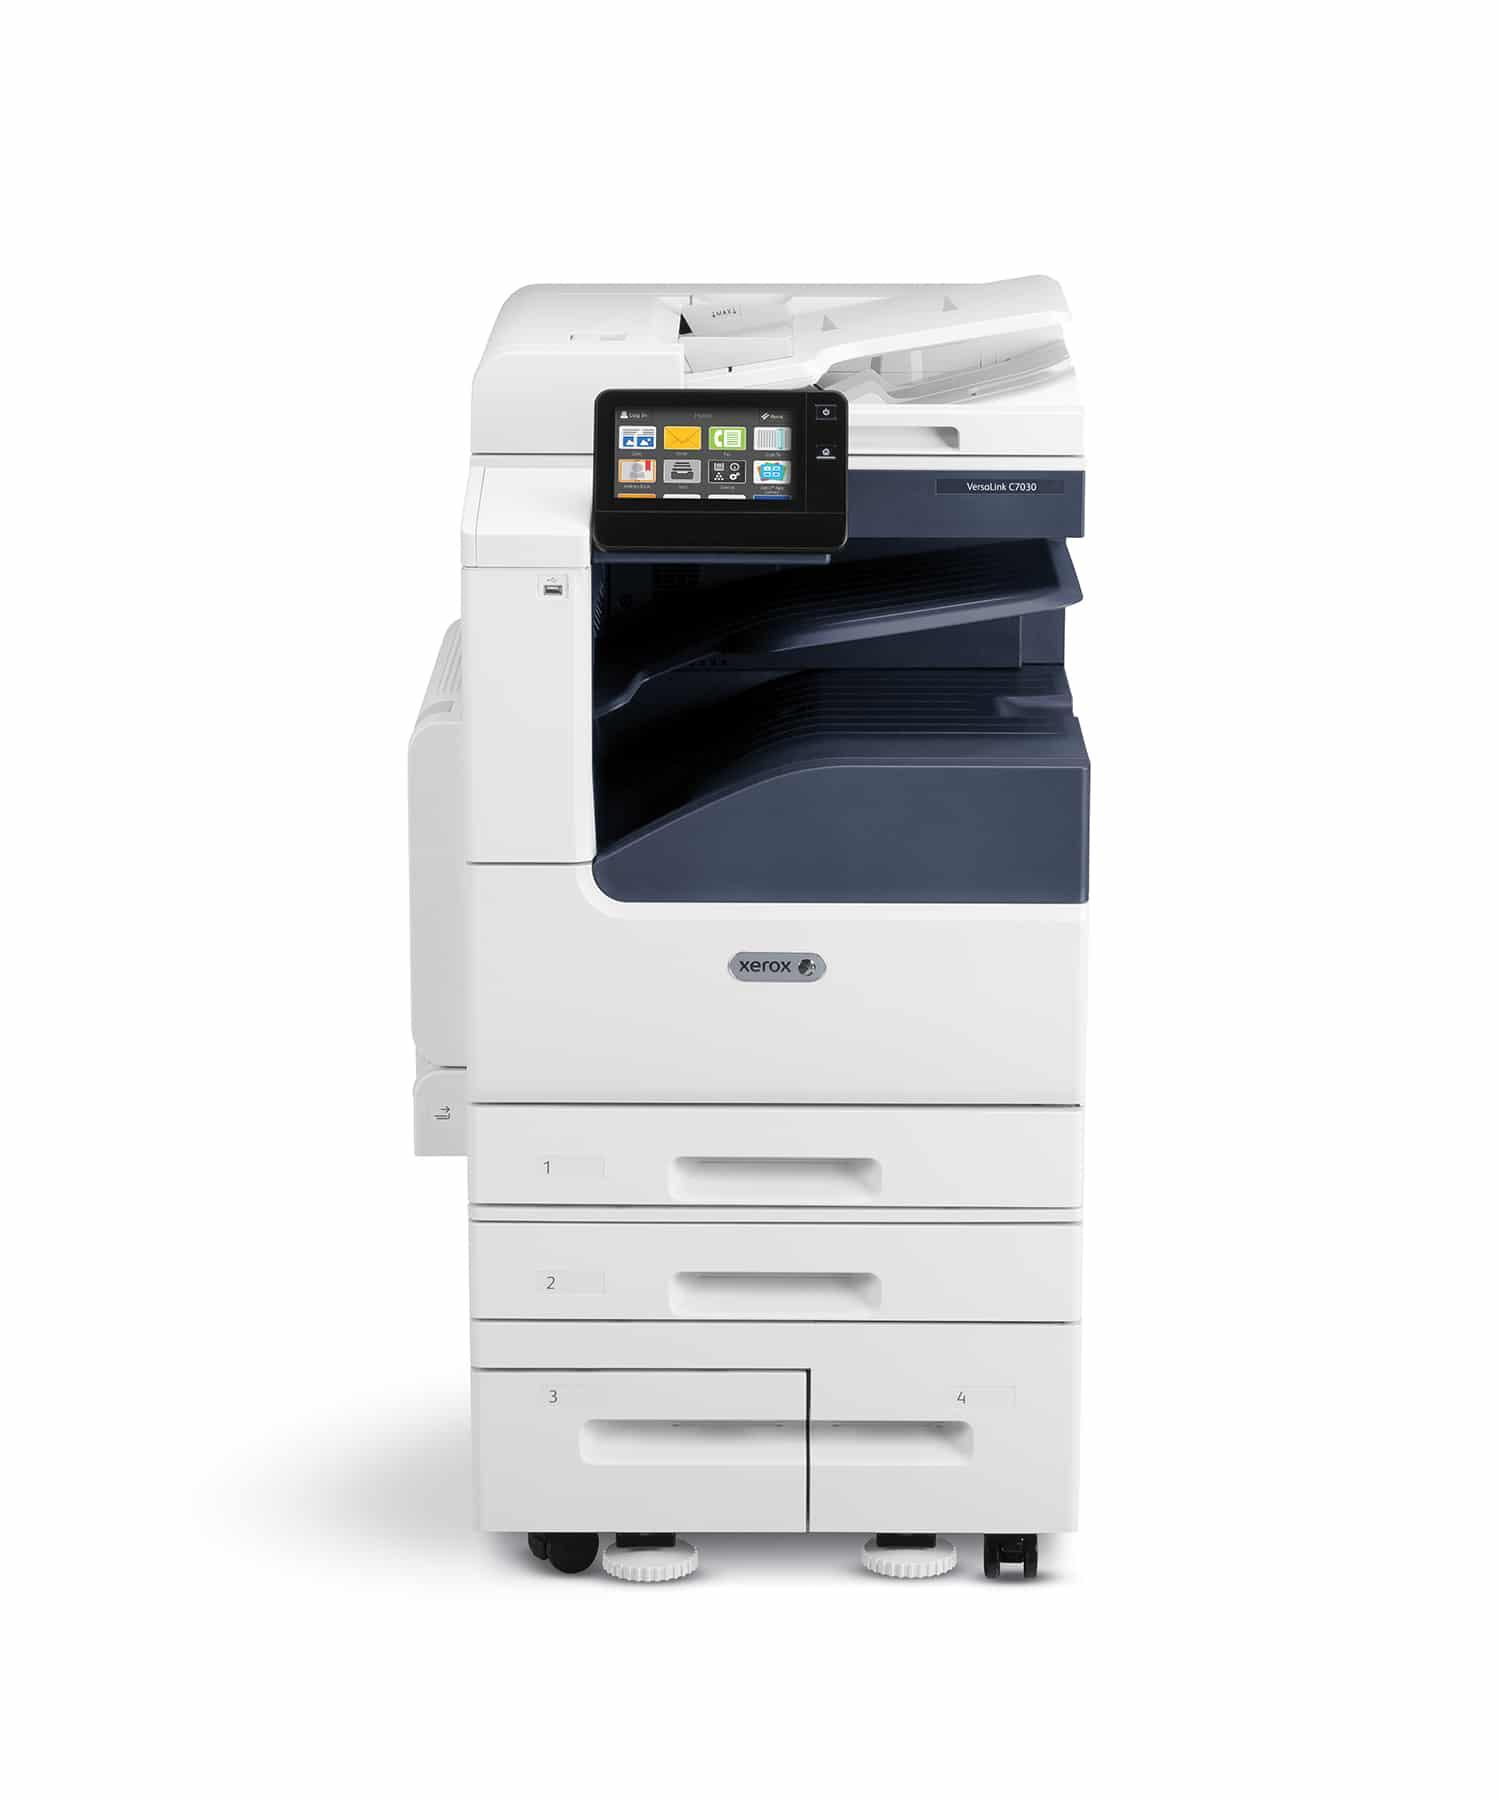 Impresora multifunción Xerox VersaLink C7020